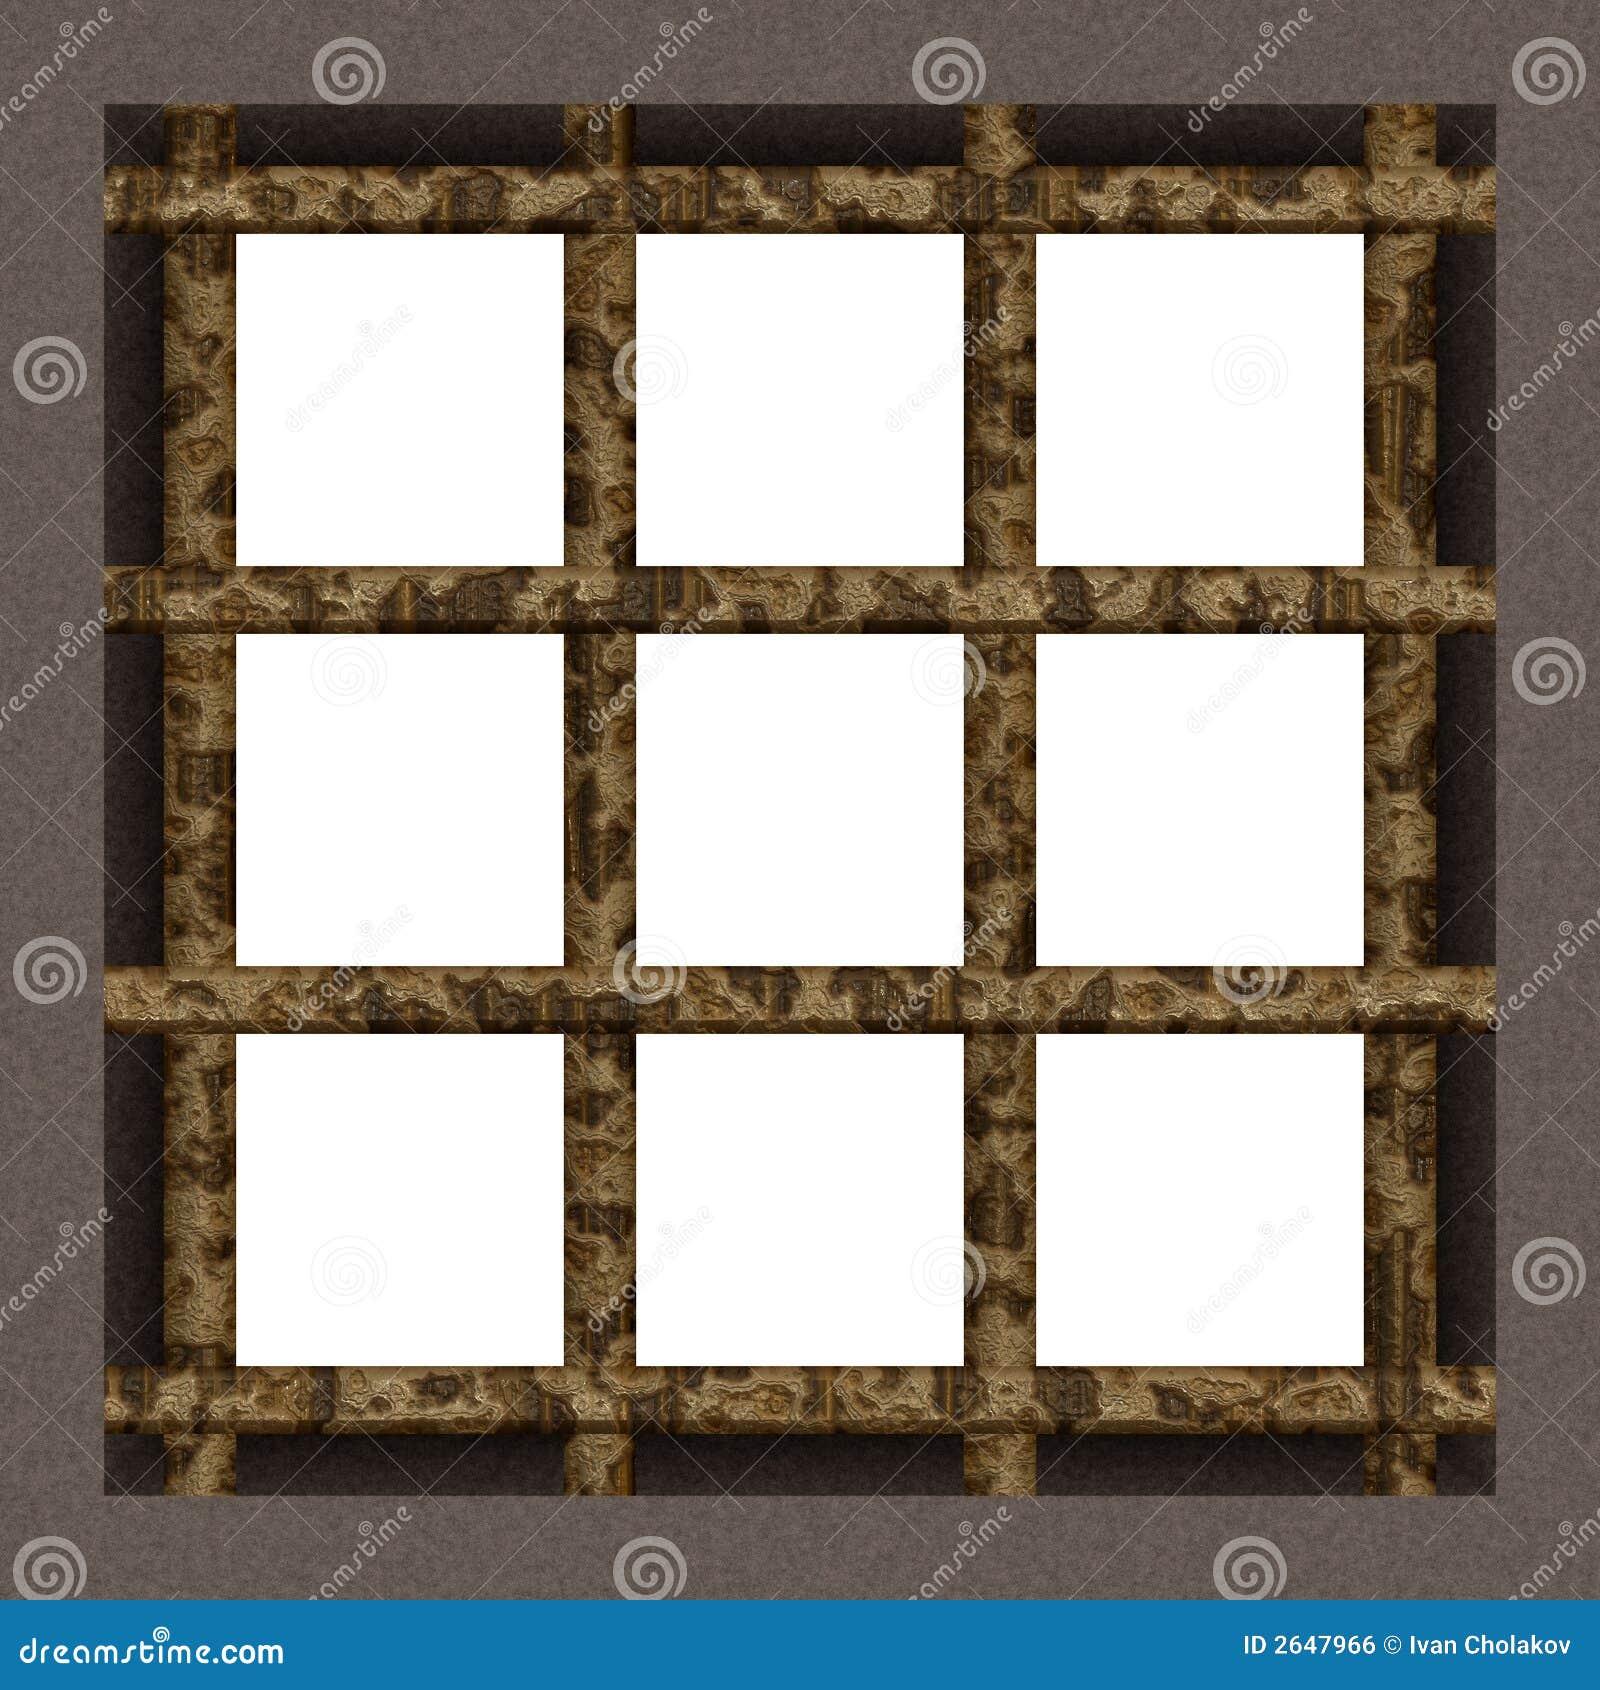 Prison cell window stock illustration. Illustration of iron - 2647966